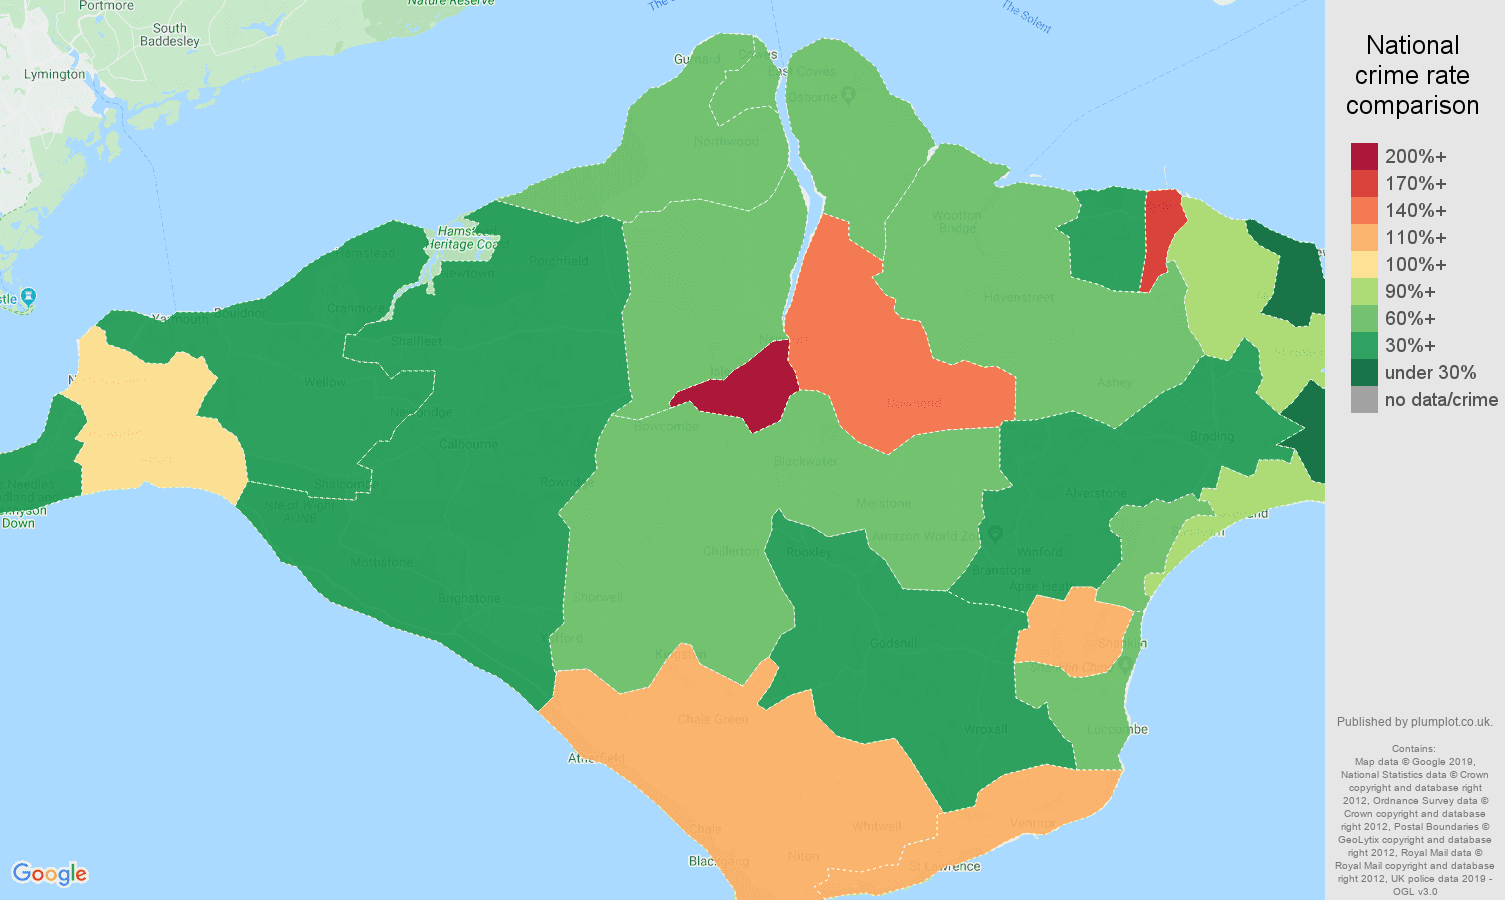 Isle of Wight public order crime rate comparison map